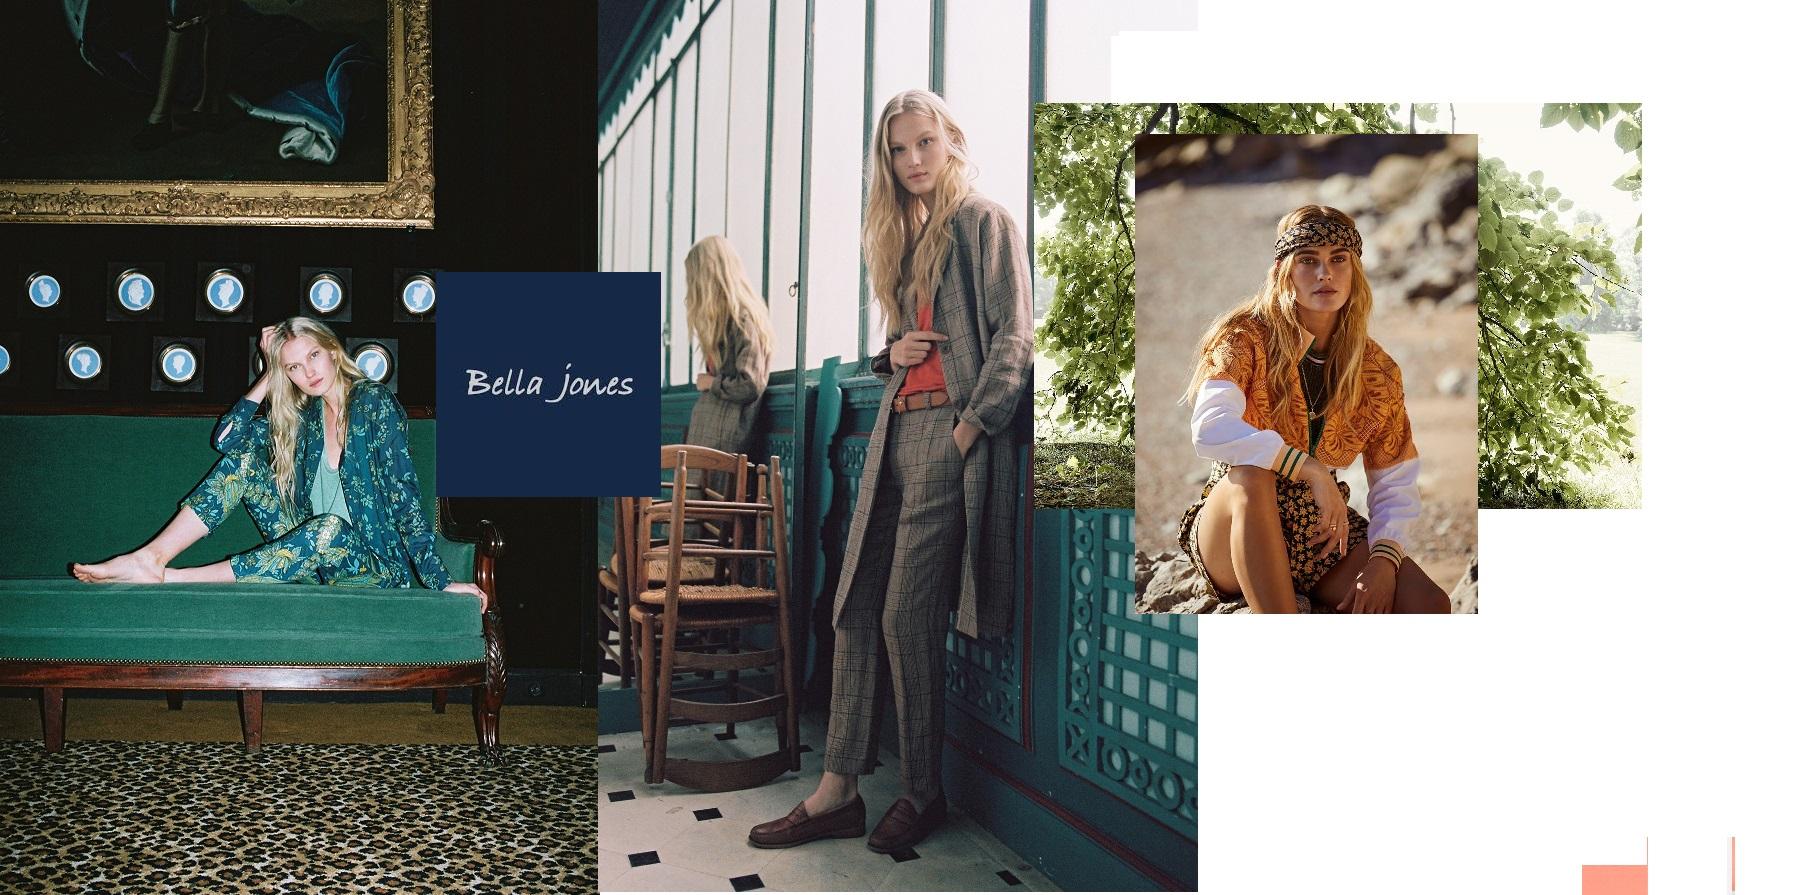 https://www.ideal-shopping.fr/marques-3/bella-jones.html